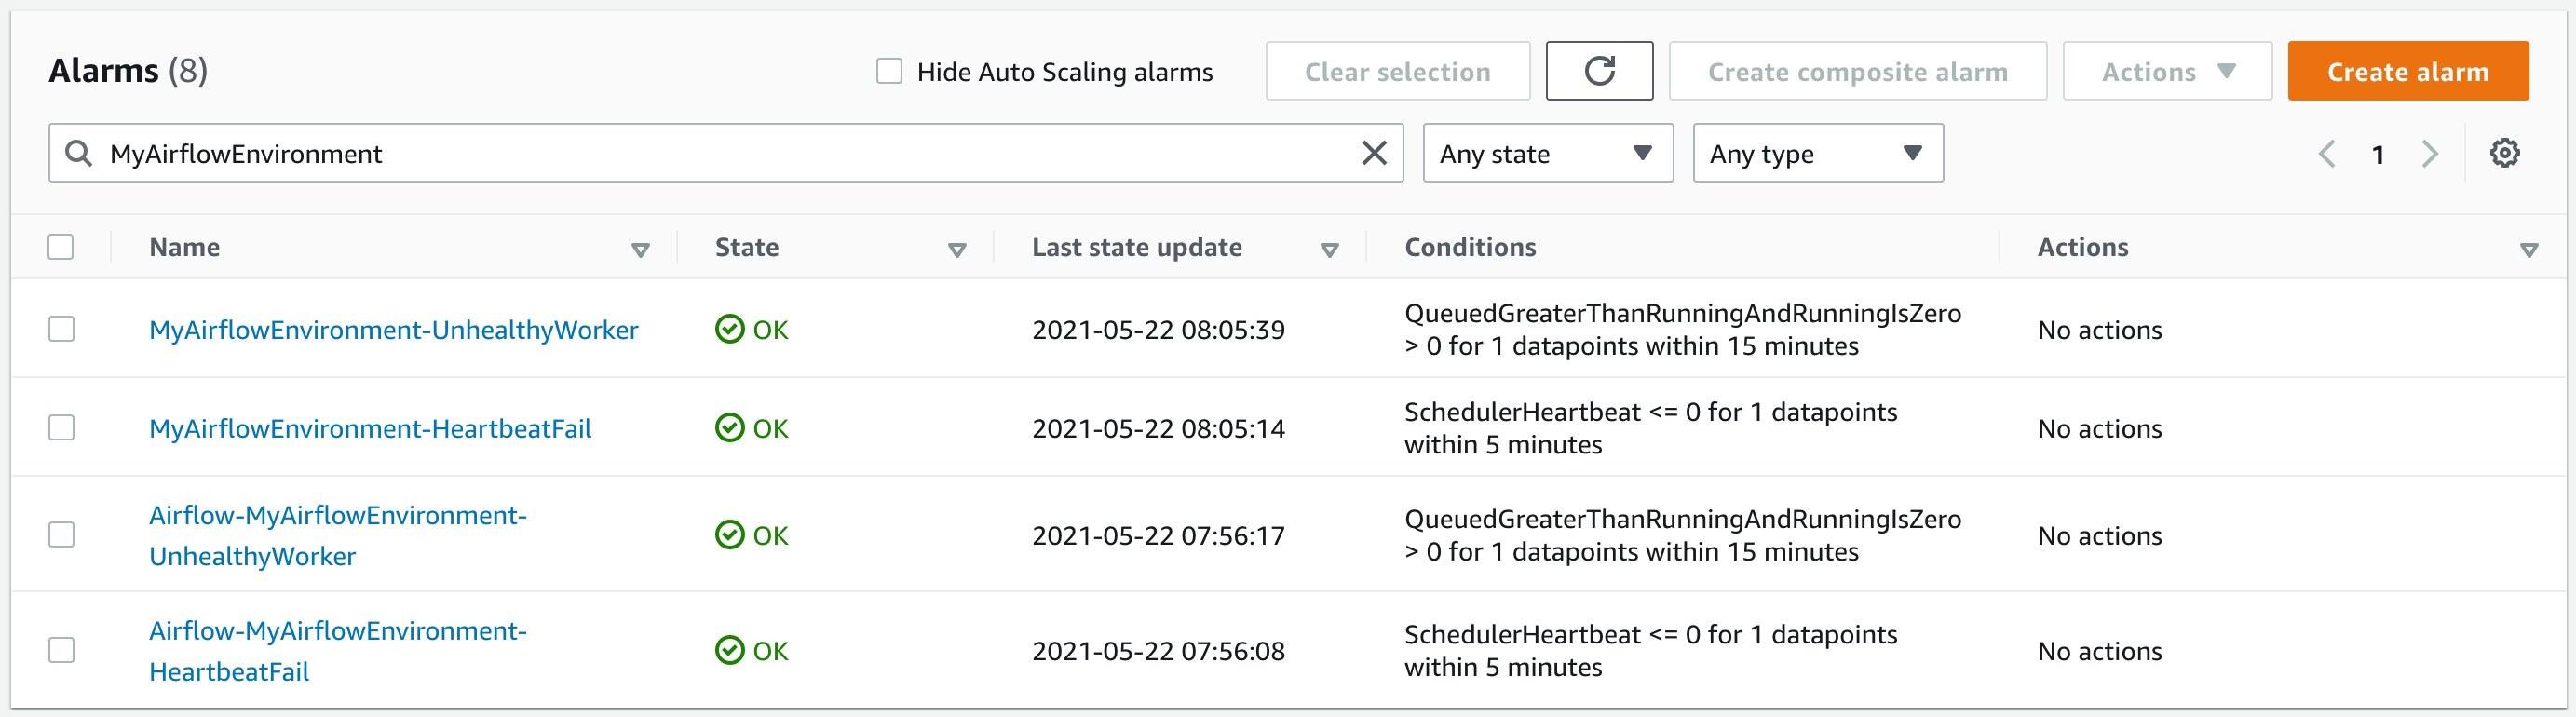 CloudWatch alarms list